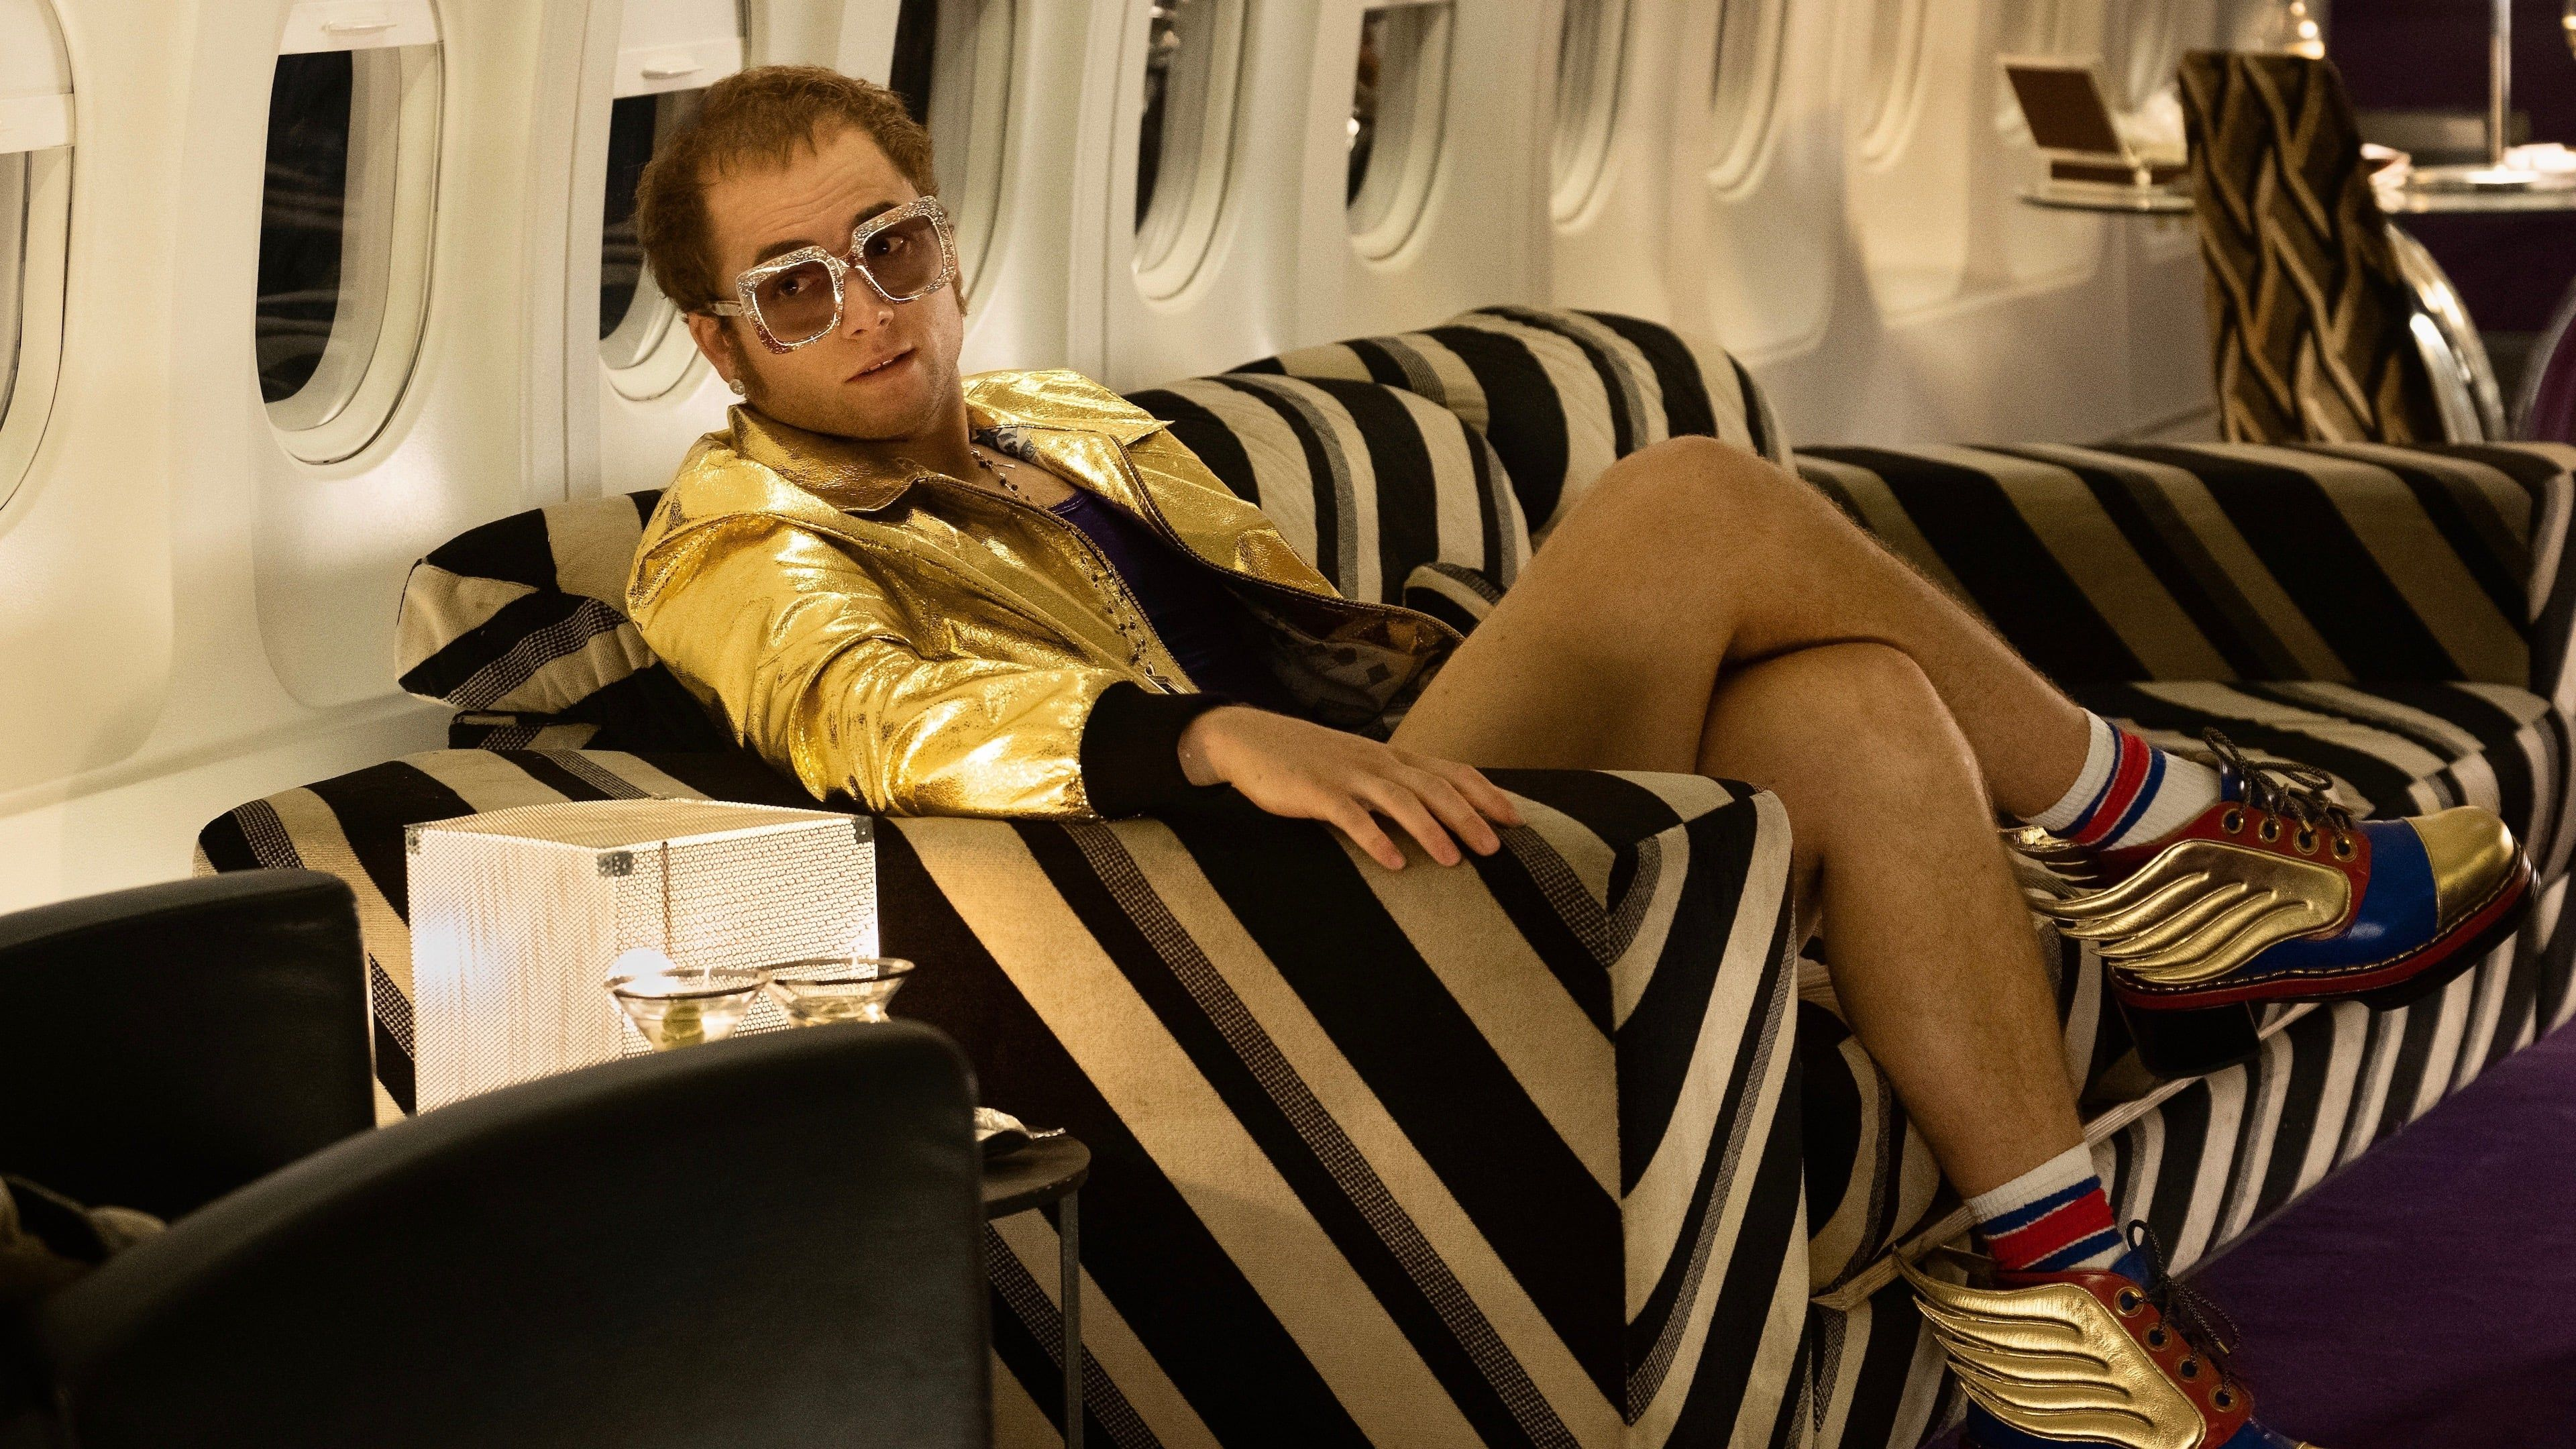 Rocketman 2019 Teljes Film Magyarul Online Hd Hu Mozi Rocketman 2019 Teljes Film Magyarul Online Hd Rocketman 2019 Teljes Elton John John Movie Taron Egerton